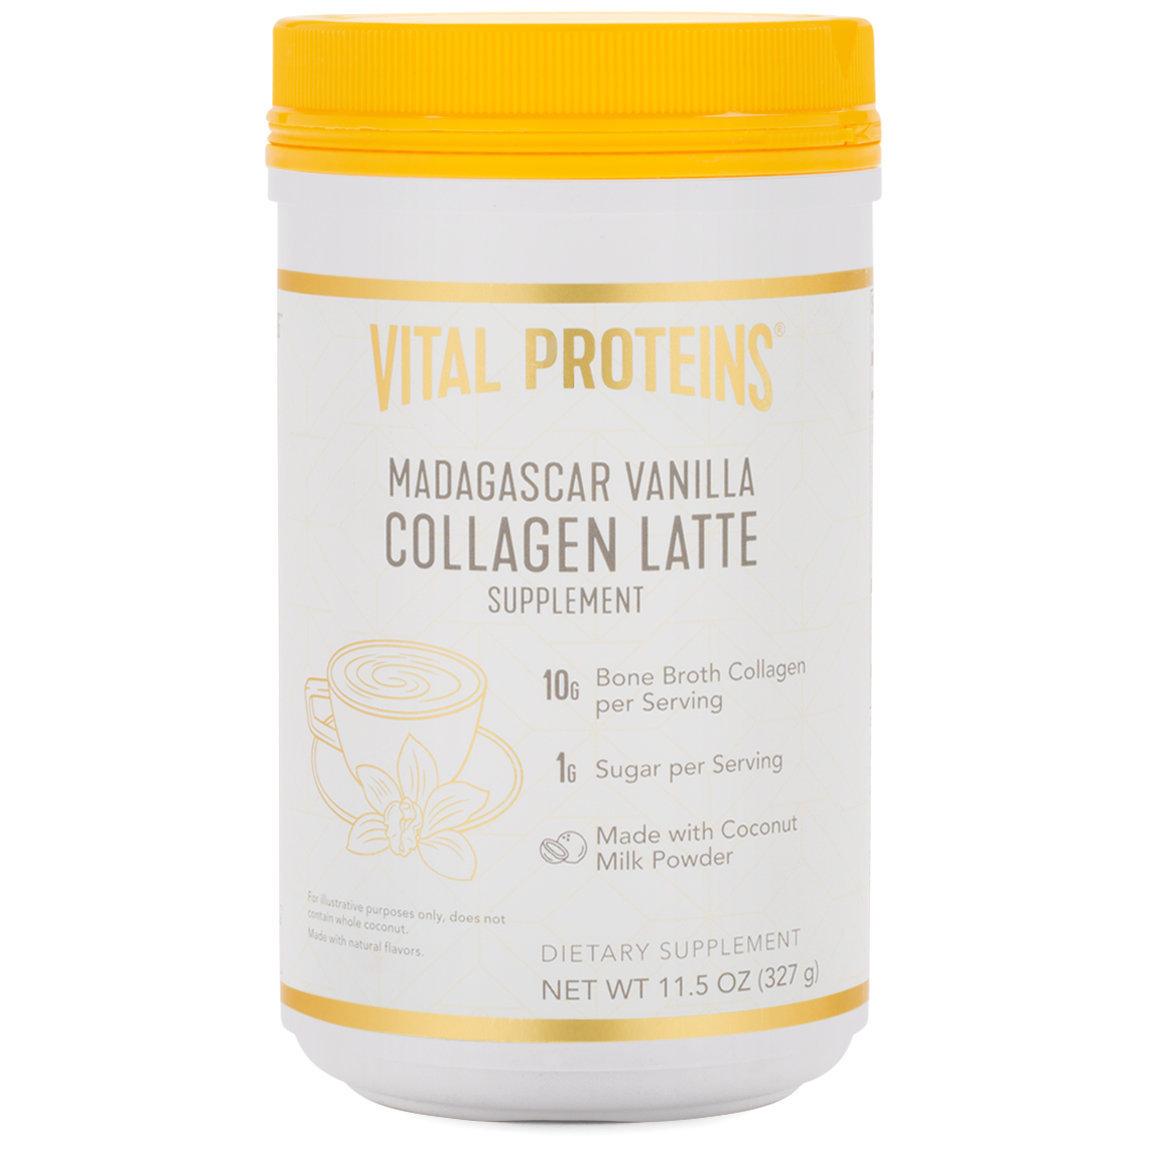 Vital Proteins Collagen Latte - Madagascar Vanilla alternative view 1 - product swatch.